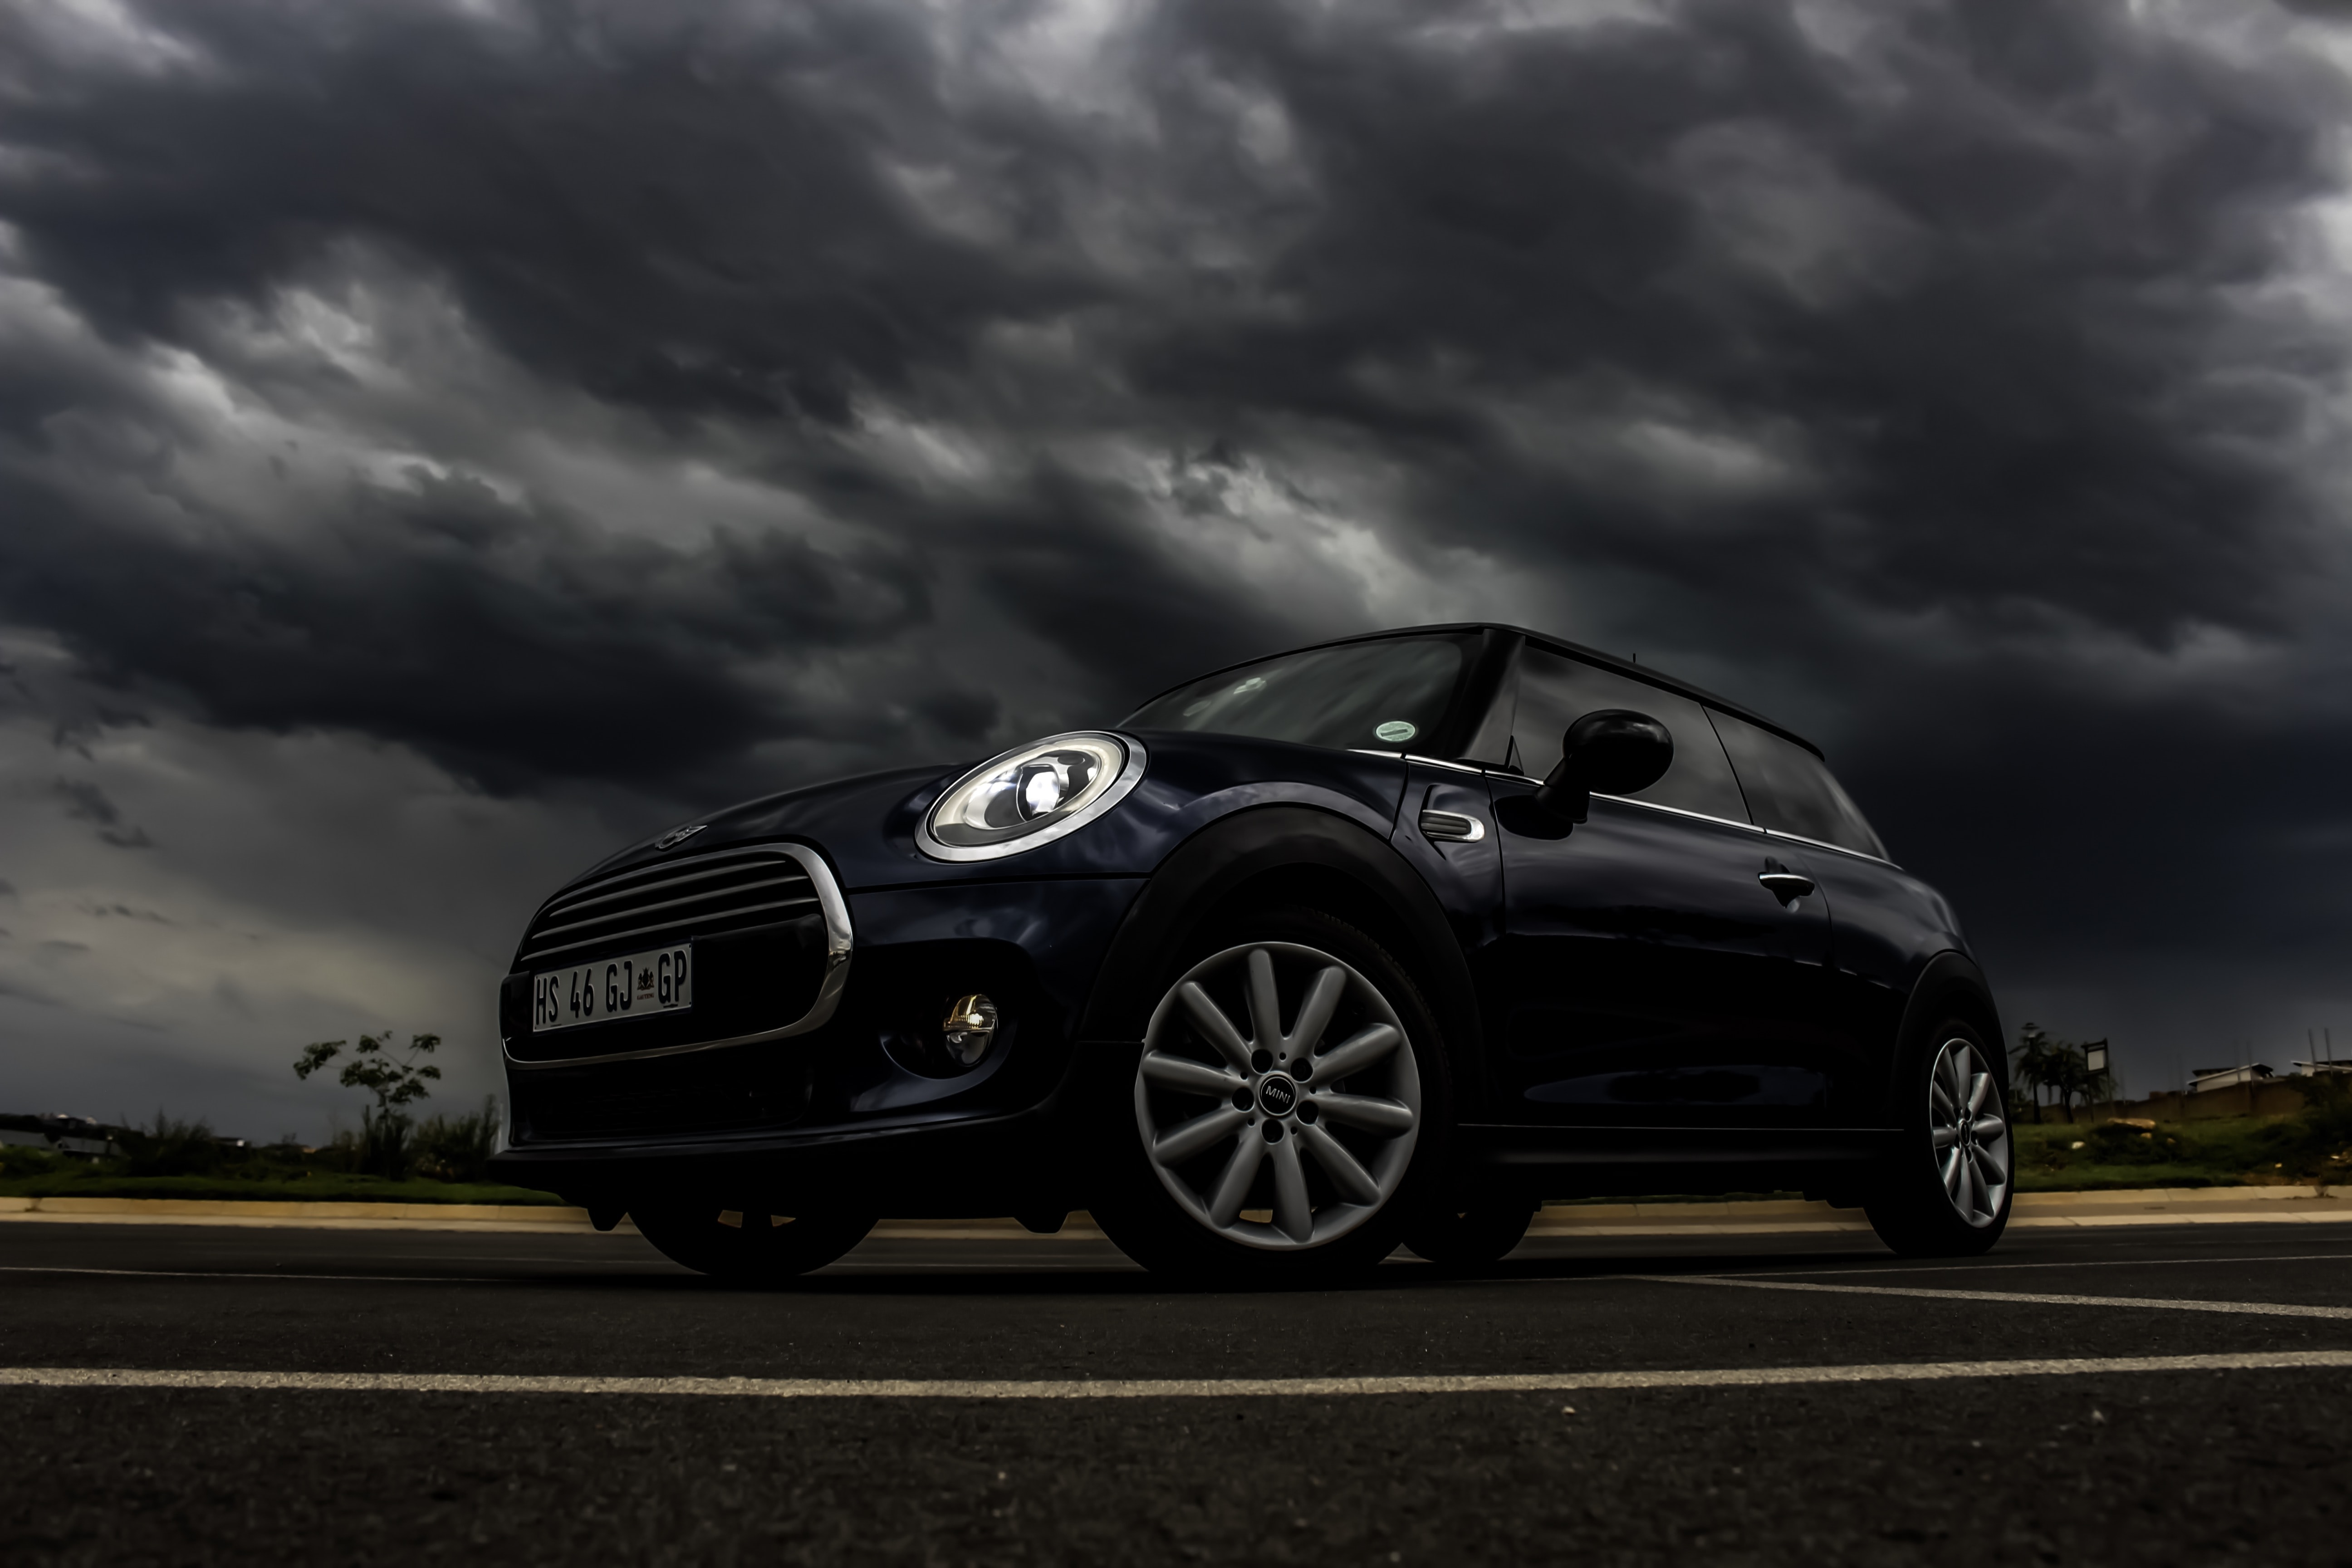 black Mini Cooper 3-door hatchback on road under cloudy daytime